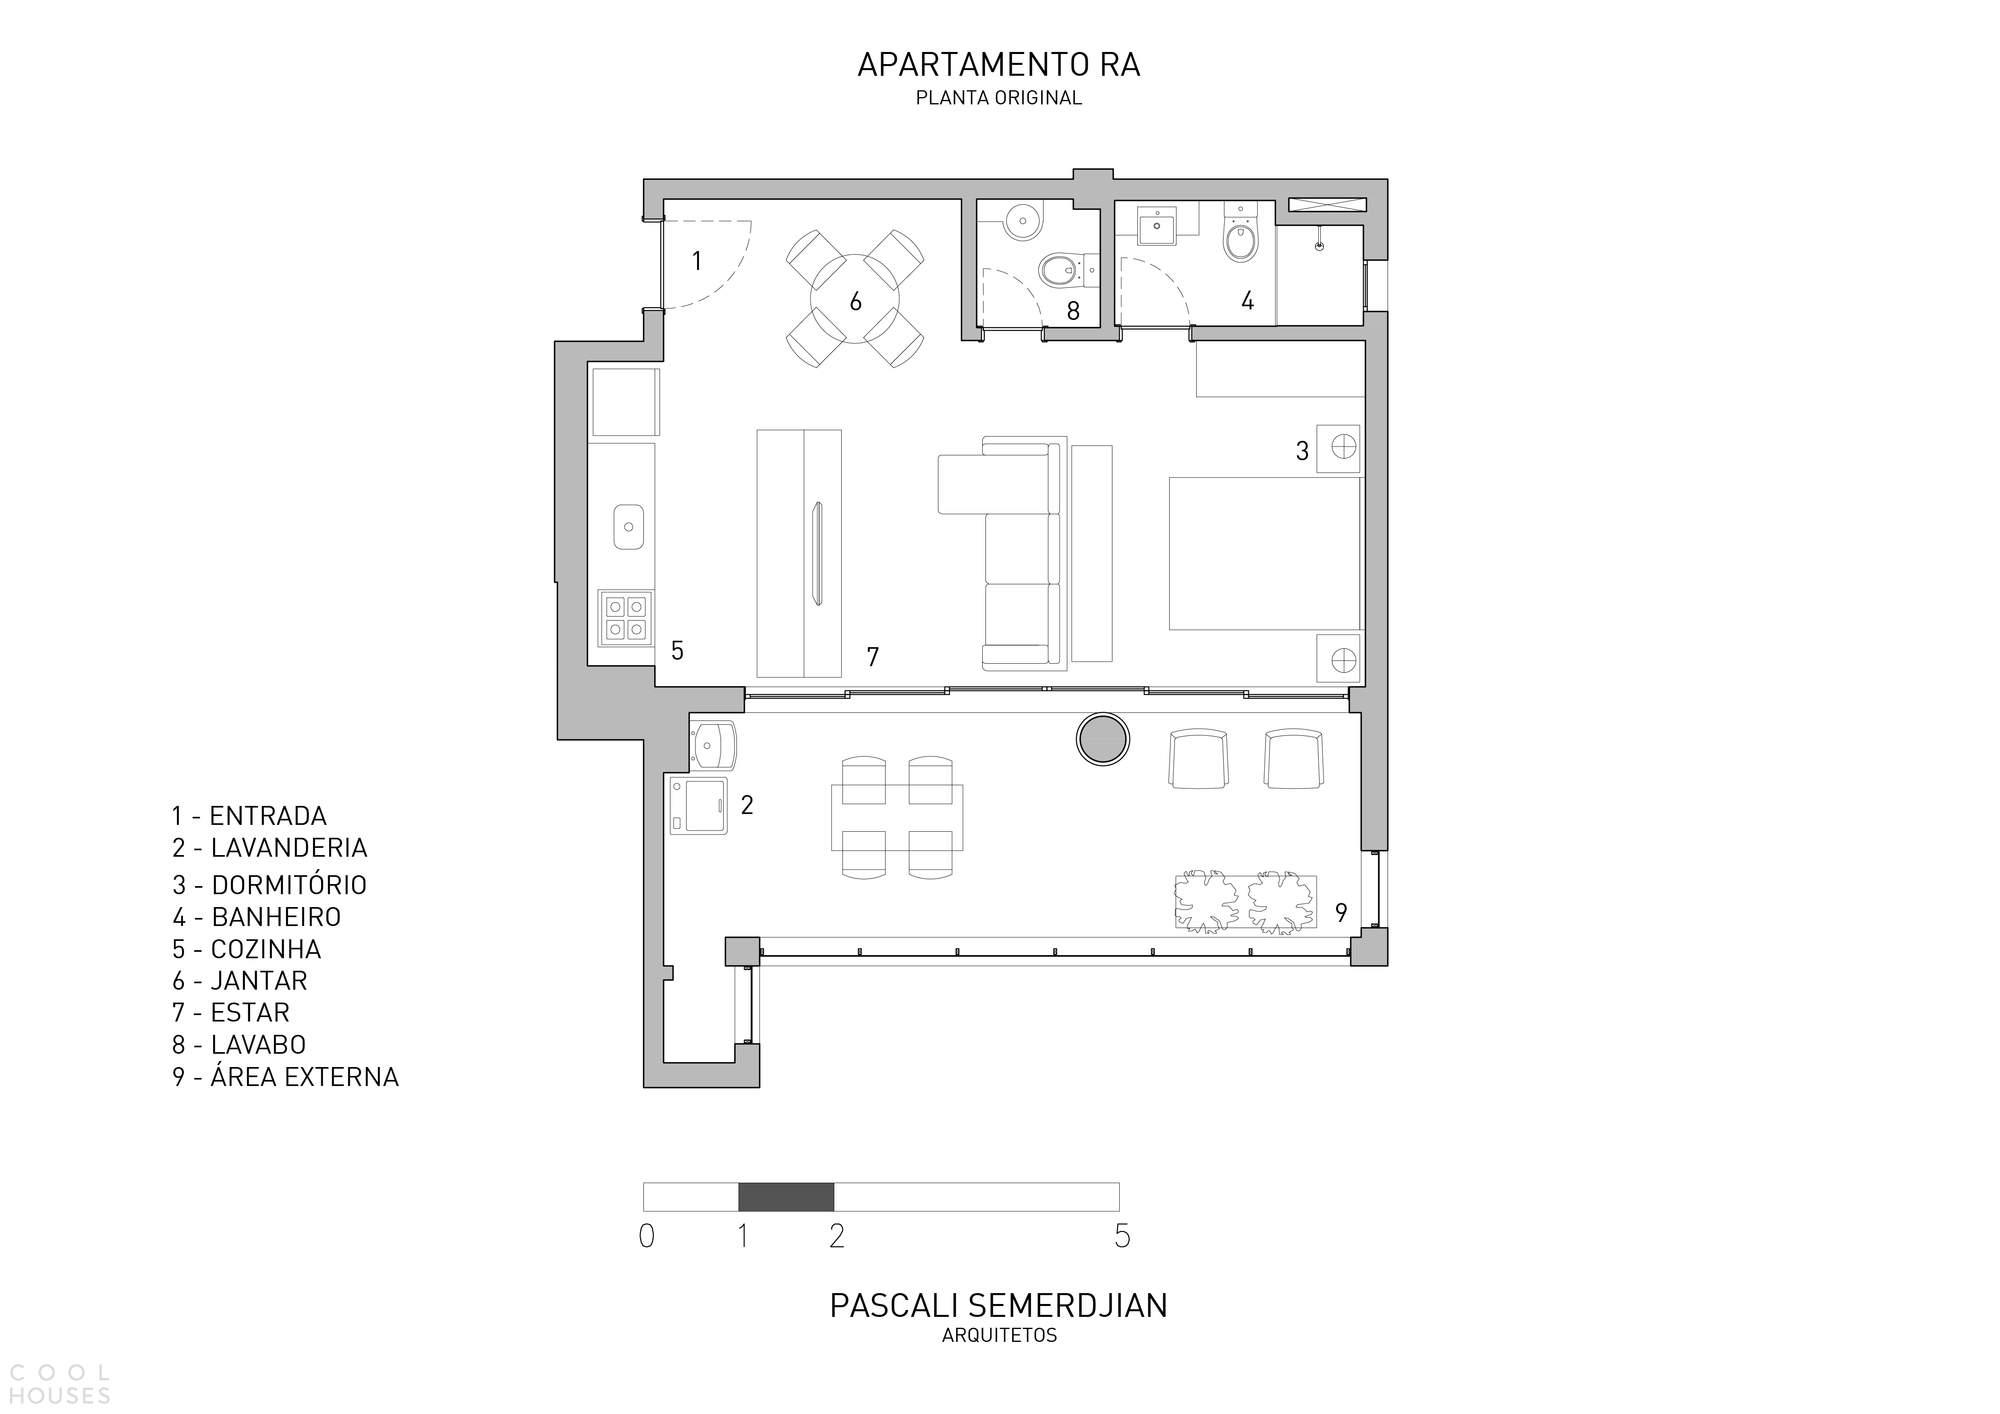 Квартира-трансформер RA Apartment, Бразилия